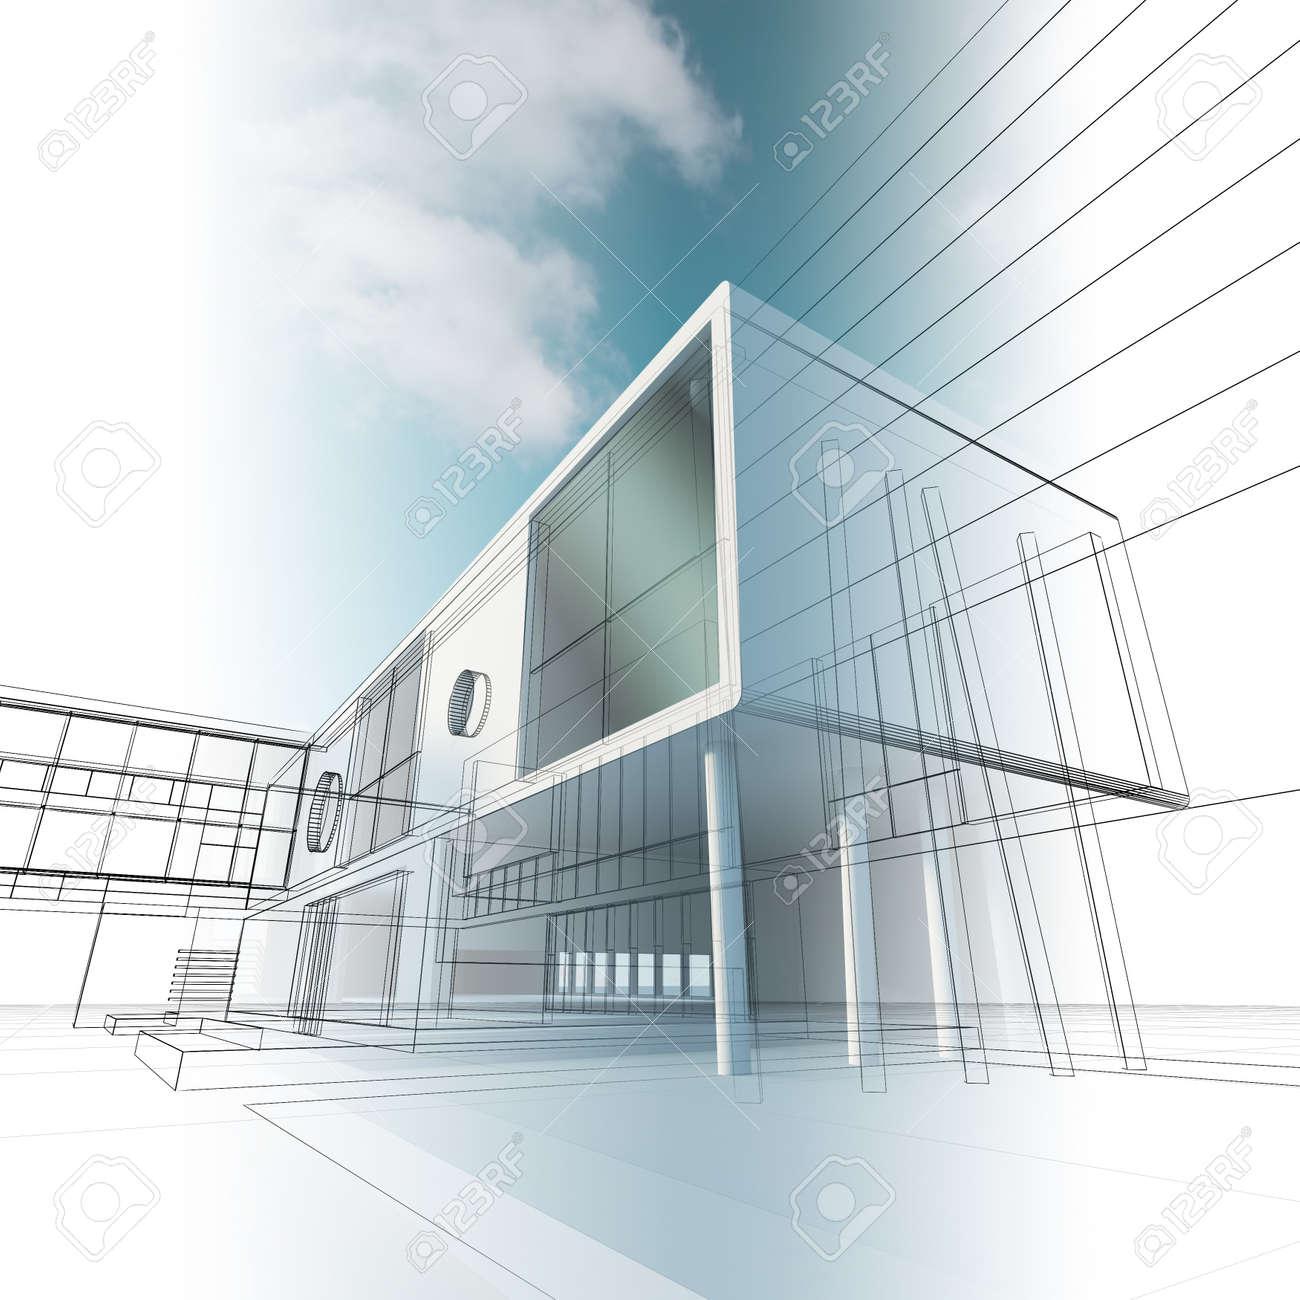 Construction architecture. Stock Photo - 8774763